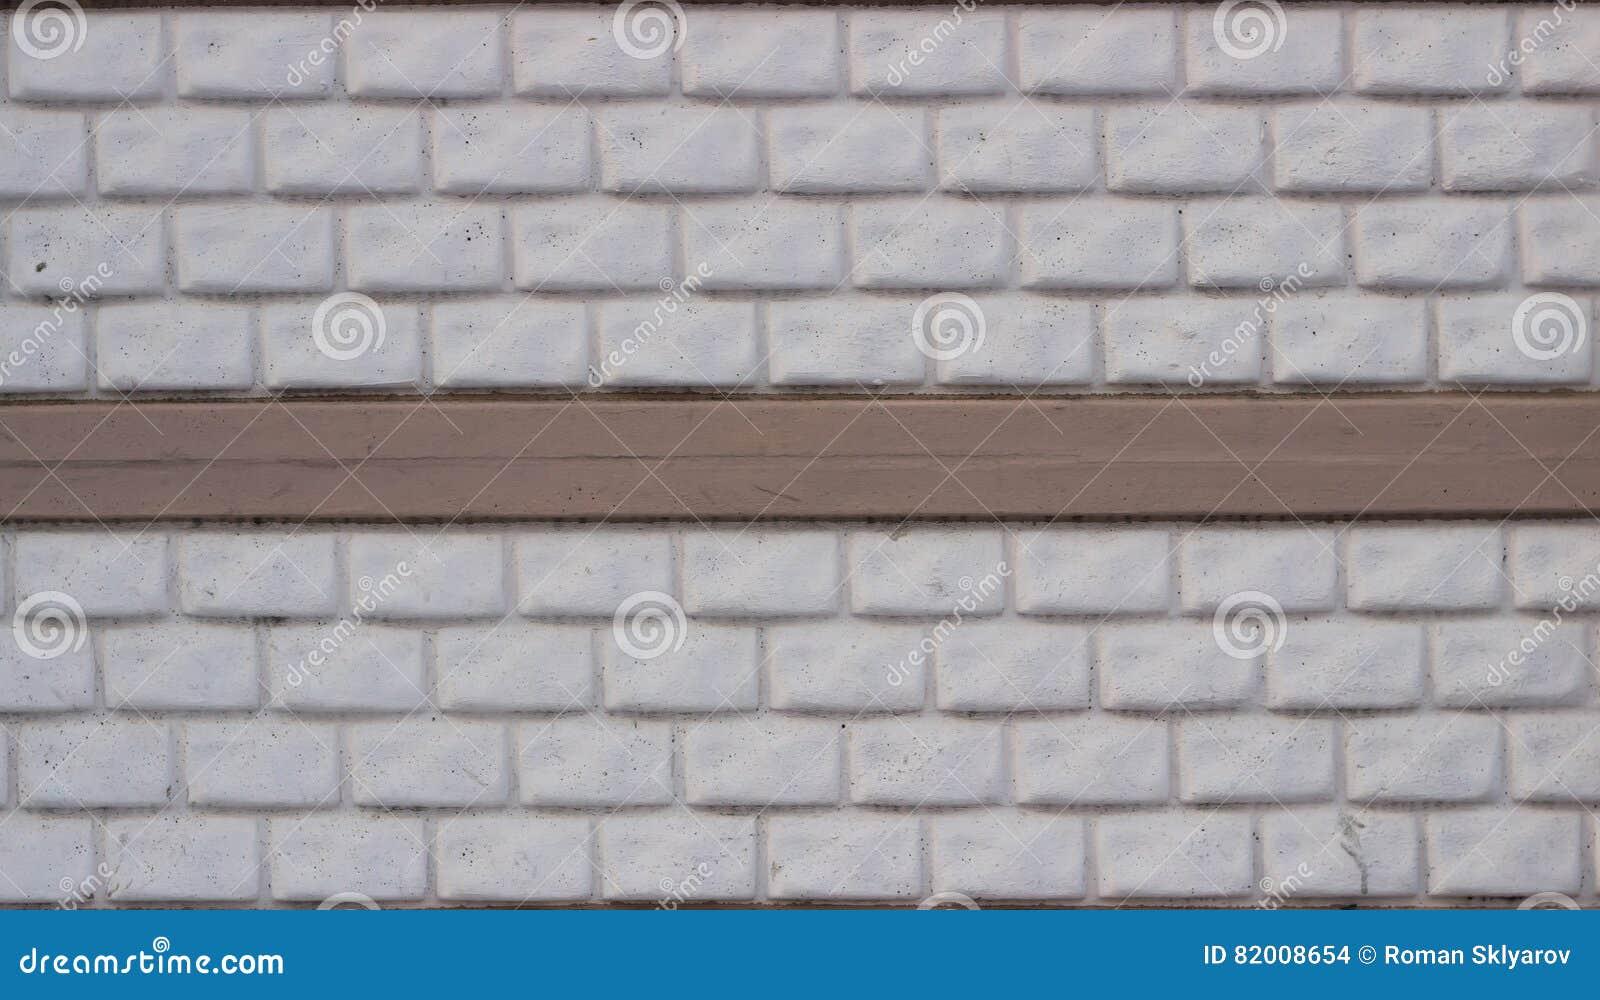 Decorative Stone Blocks : Wall made of decorative stone blocks stock photo image